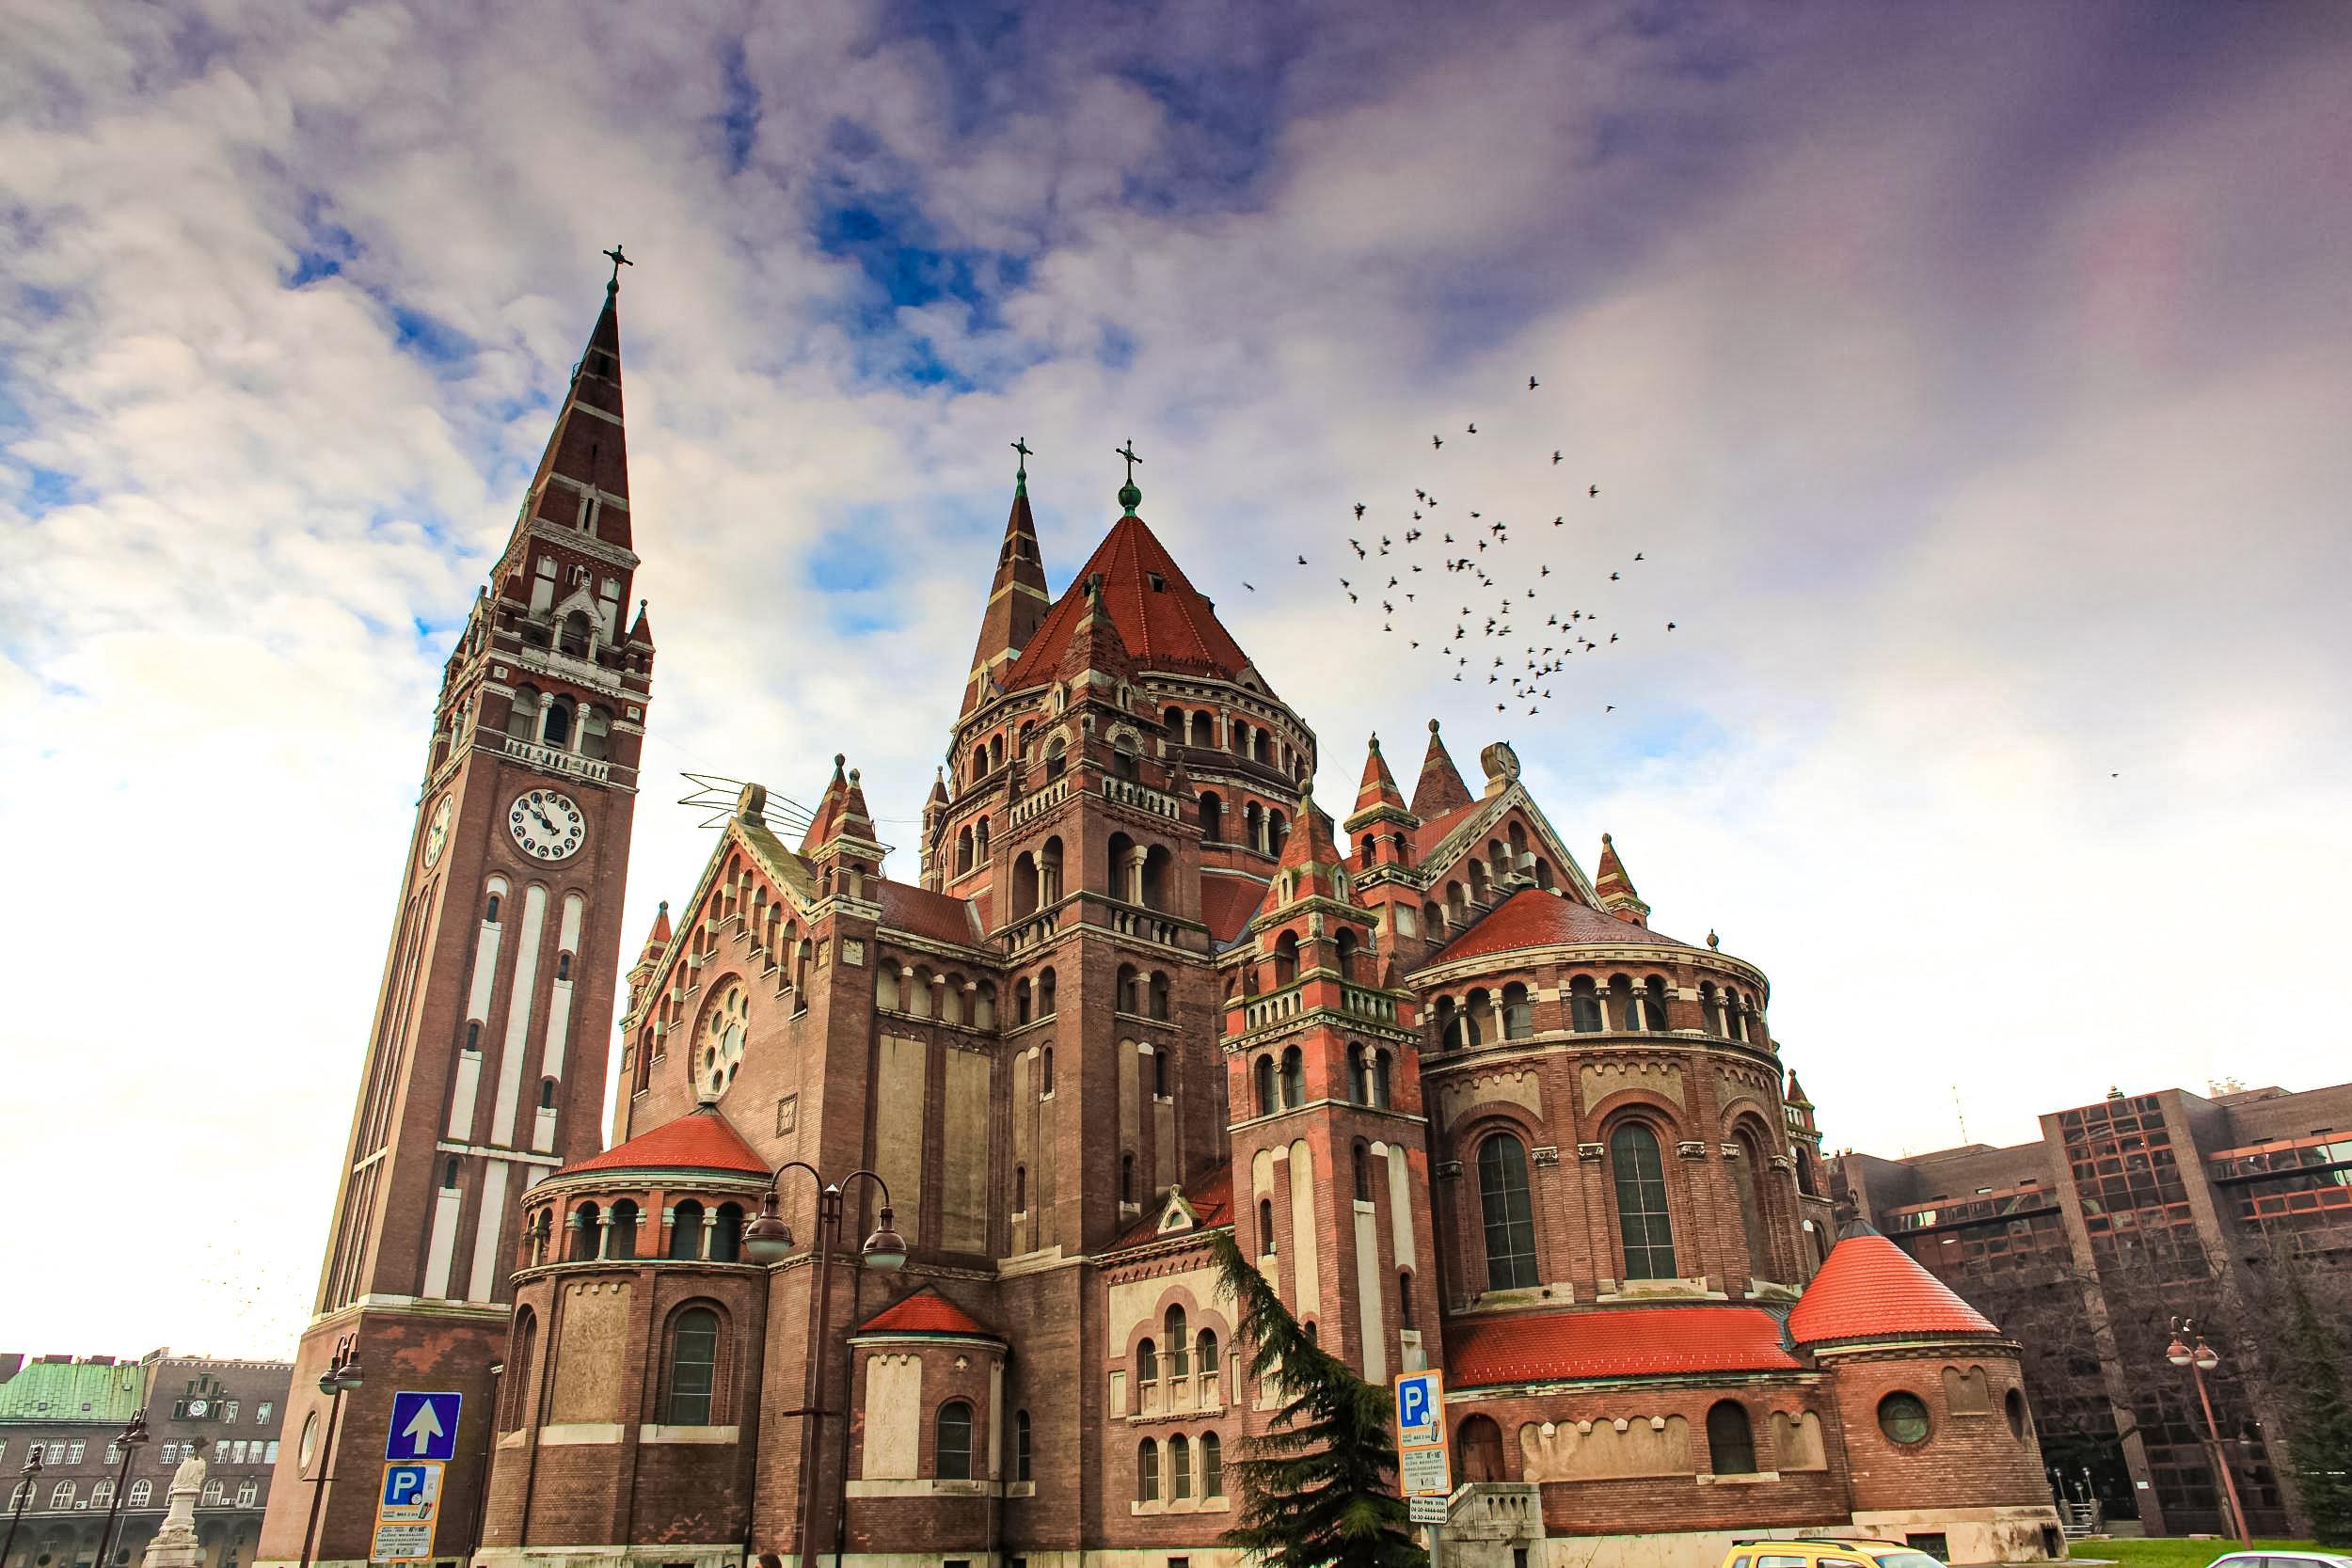 3denné Srbsko a maďarský Szeged